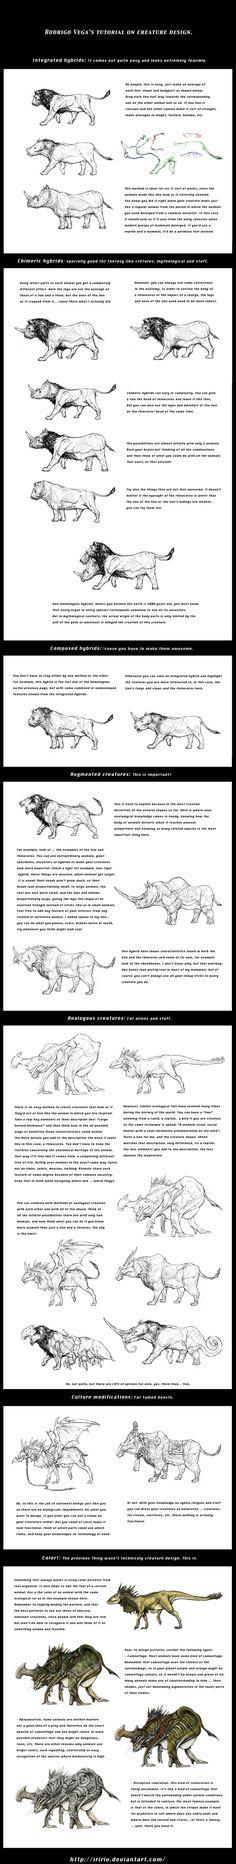 Tutorial on creature design. by Rodrigo-Vega.deviantart.com on @deviantART